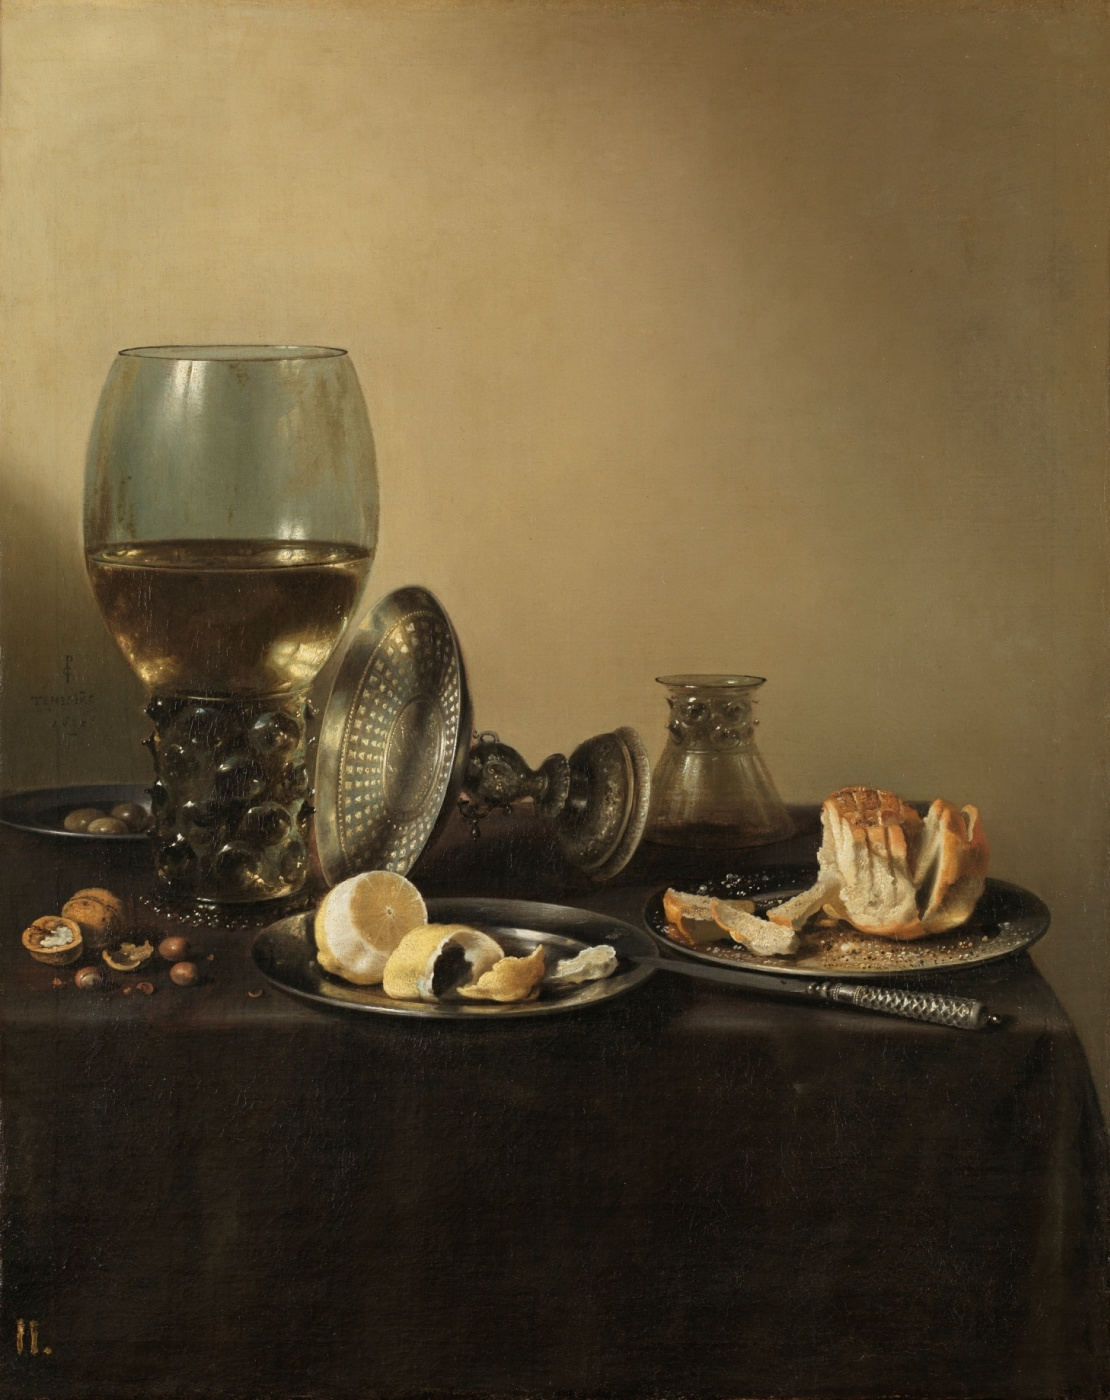 Pieter Claesz. Still Life with Römer, Silver Vase and Bread